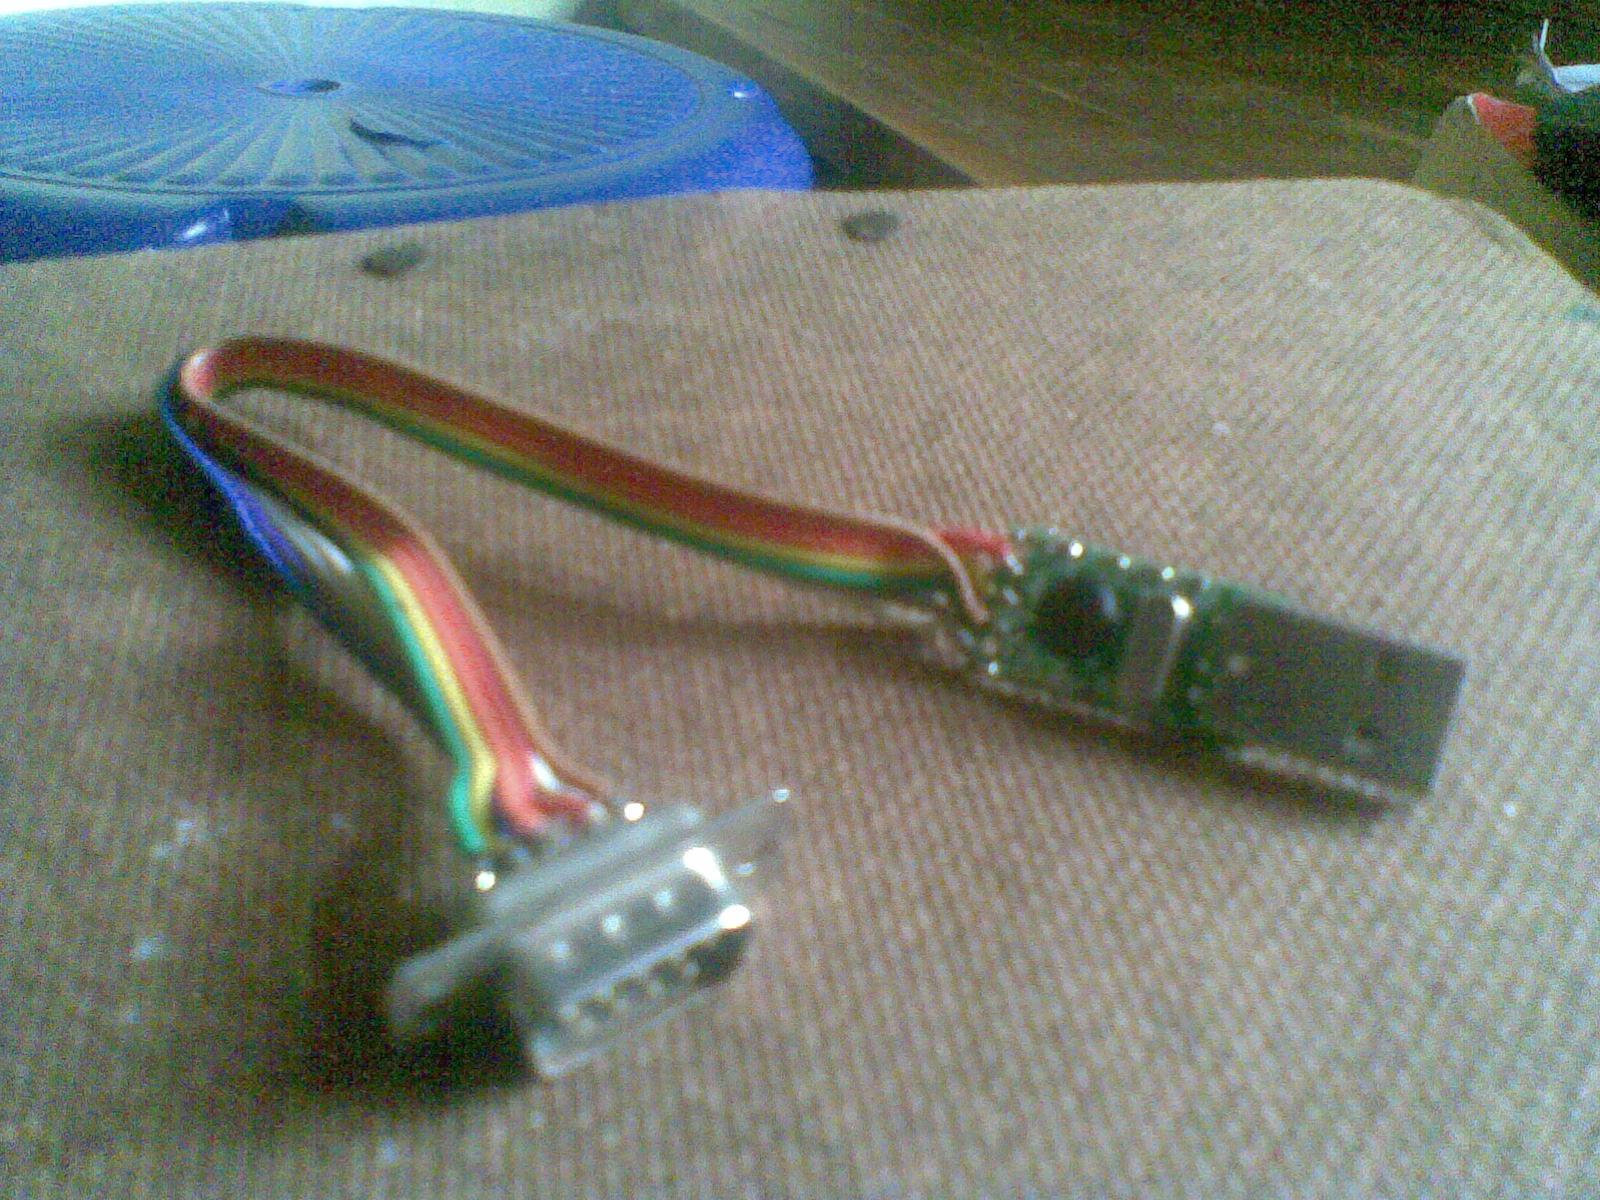 serial to usb wiring wiring diagrams favorites db9 serial to usb wiring diagram [ 1600 x 1200 Pixel ]